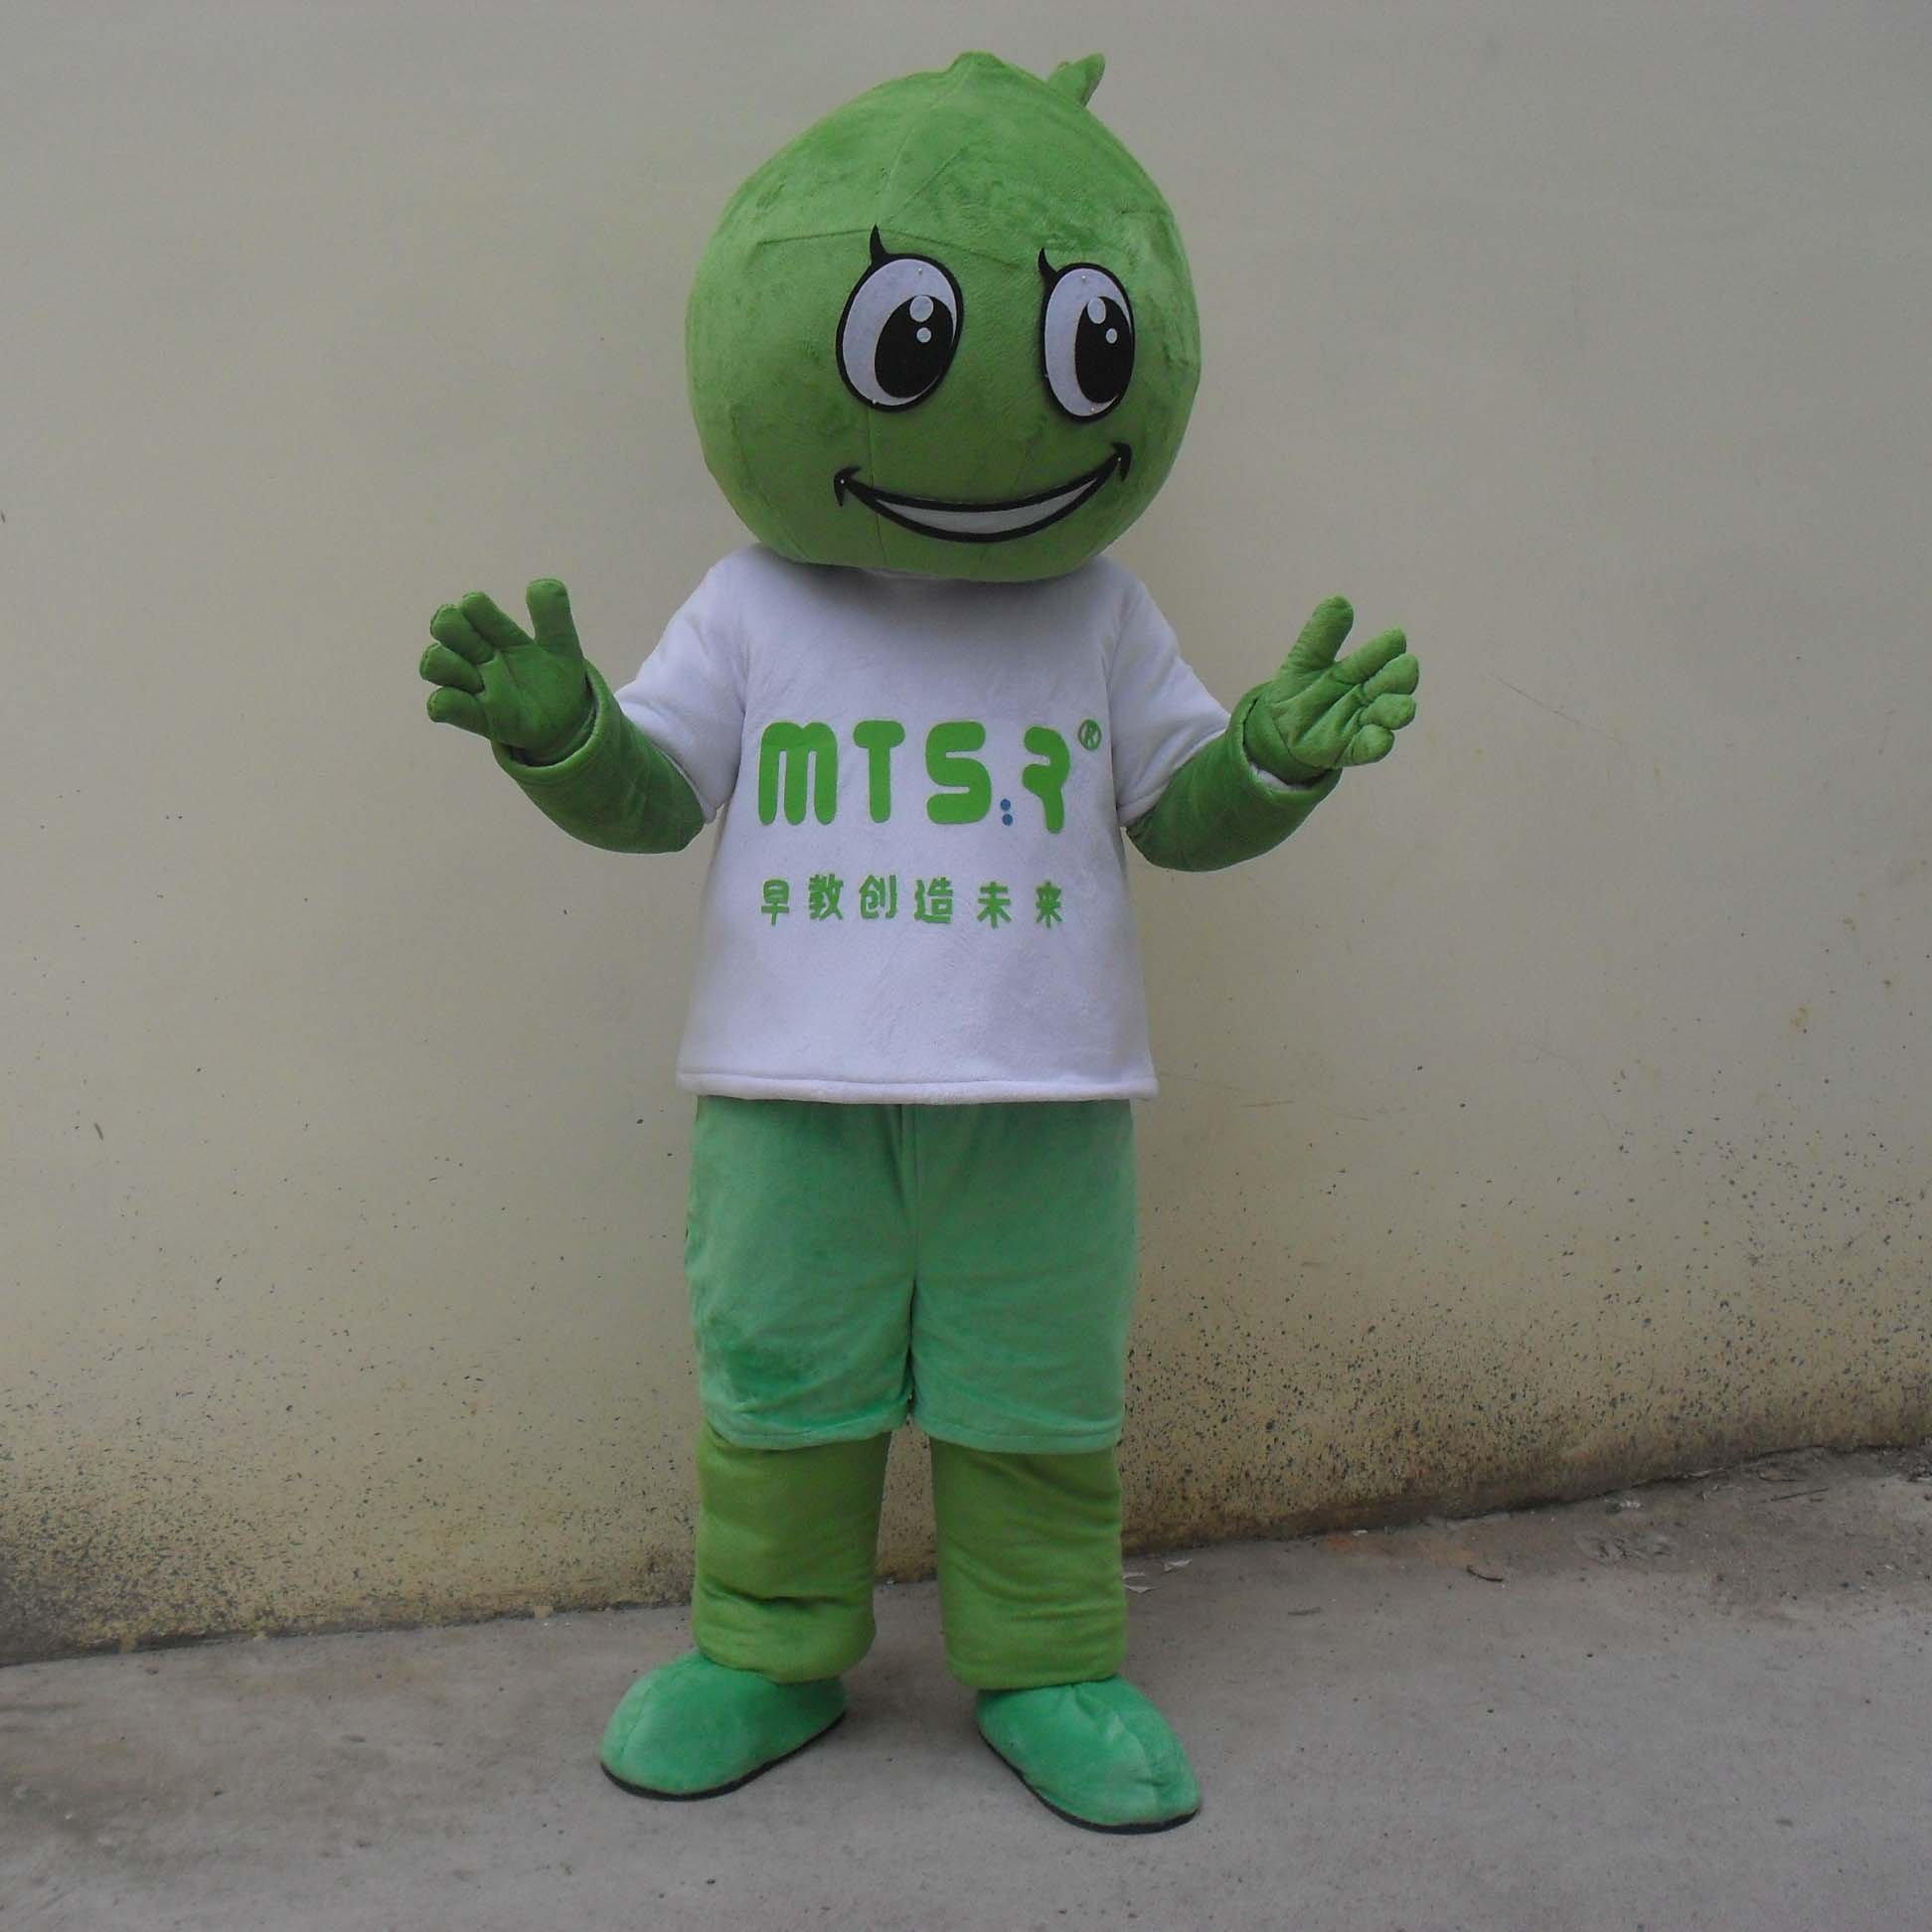 Cabbage Cartoon Dolls Walking Cartoon Costumes Performing Props Vegetables Cabbage Dolls Advertising Mascot Costume